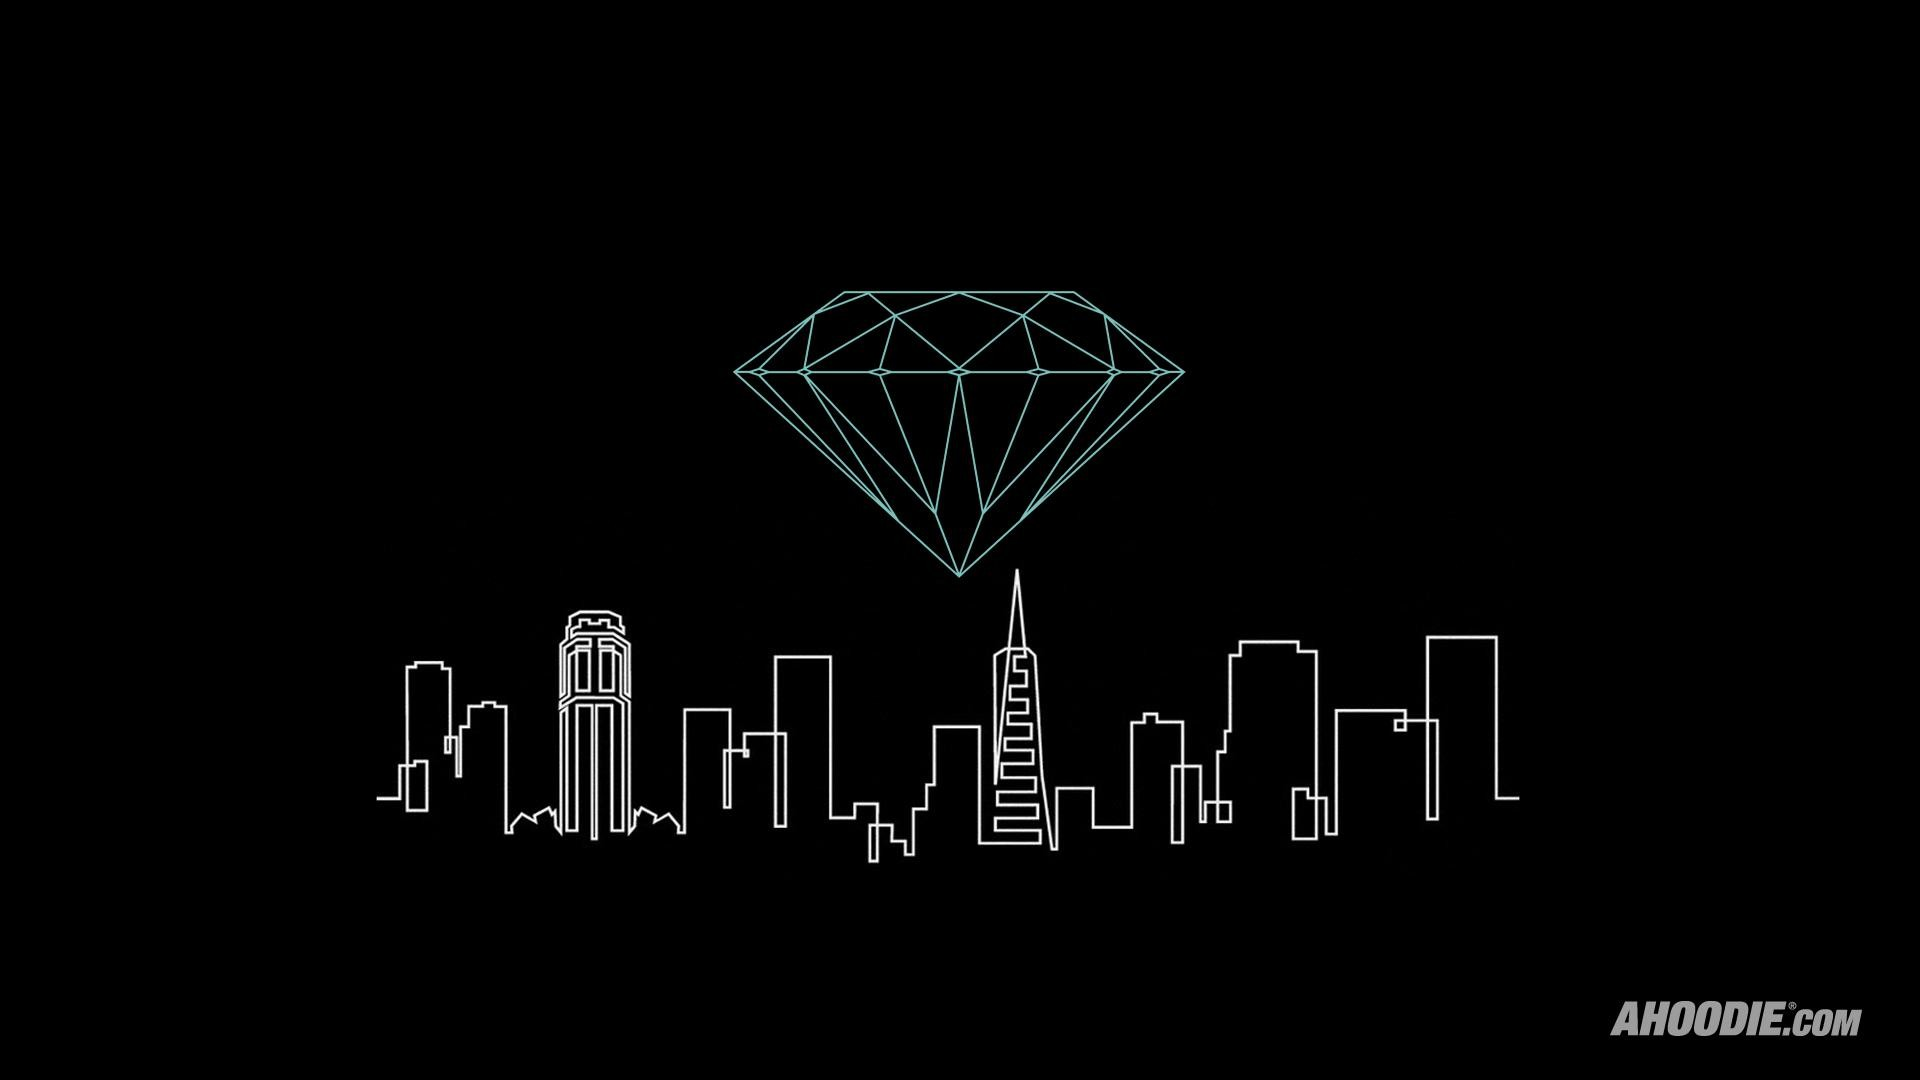 Res: 1920x1080, 8. pink-diamond-wallpaper-HD8-600x338